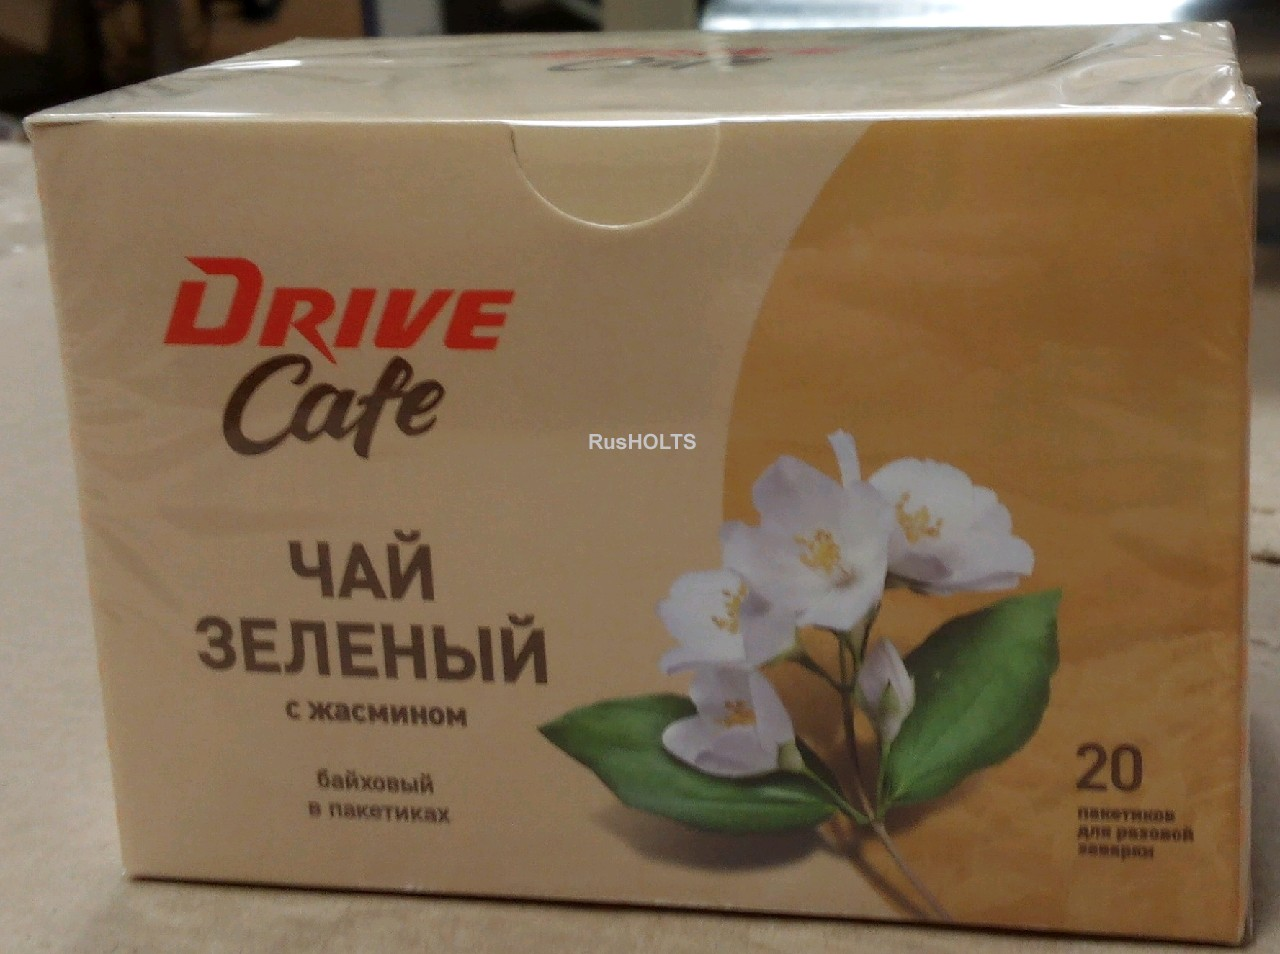 Drive Cafe Чай 2 гр